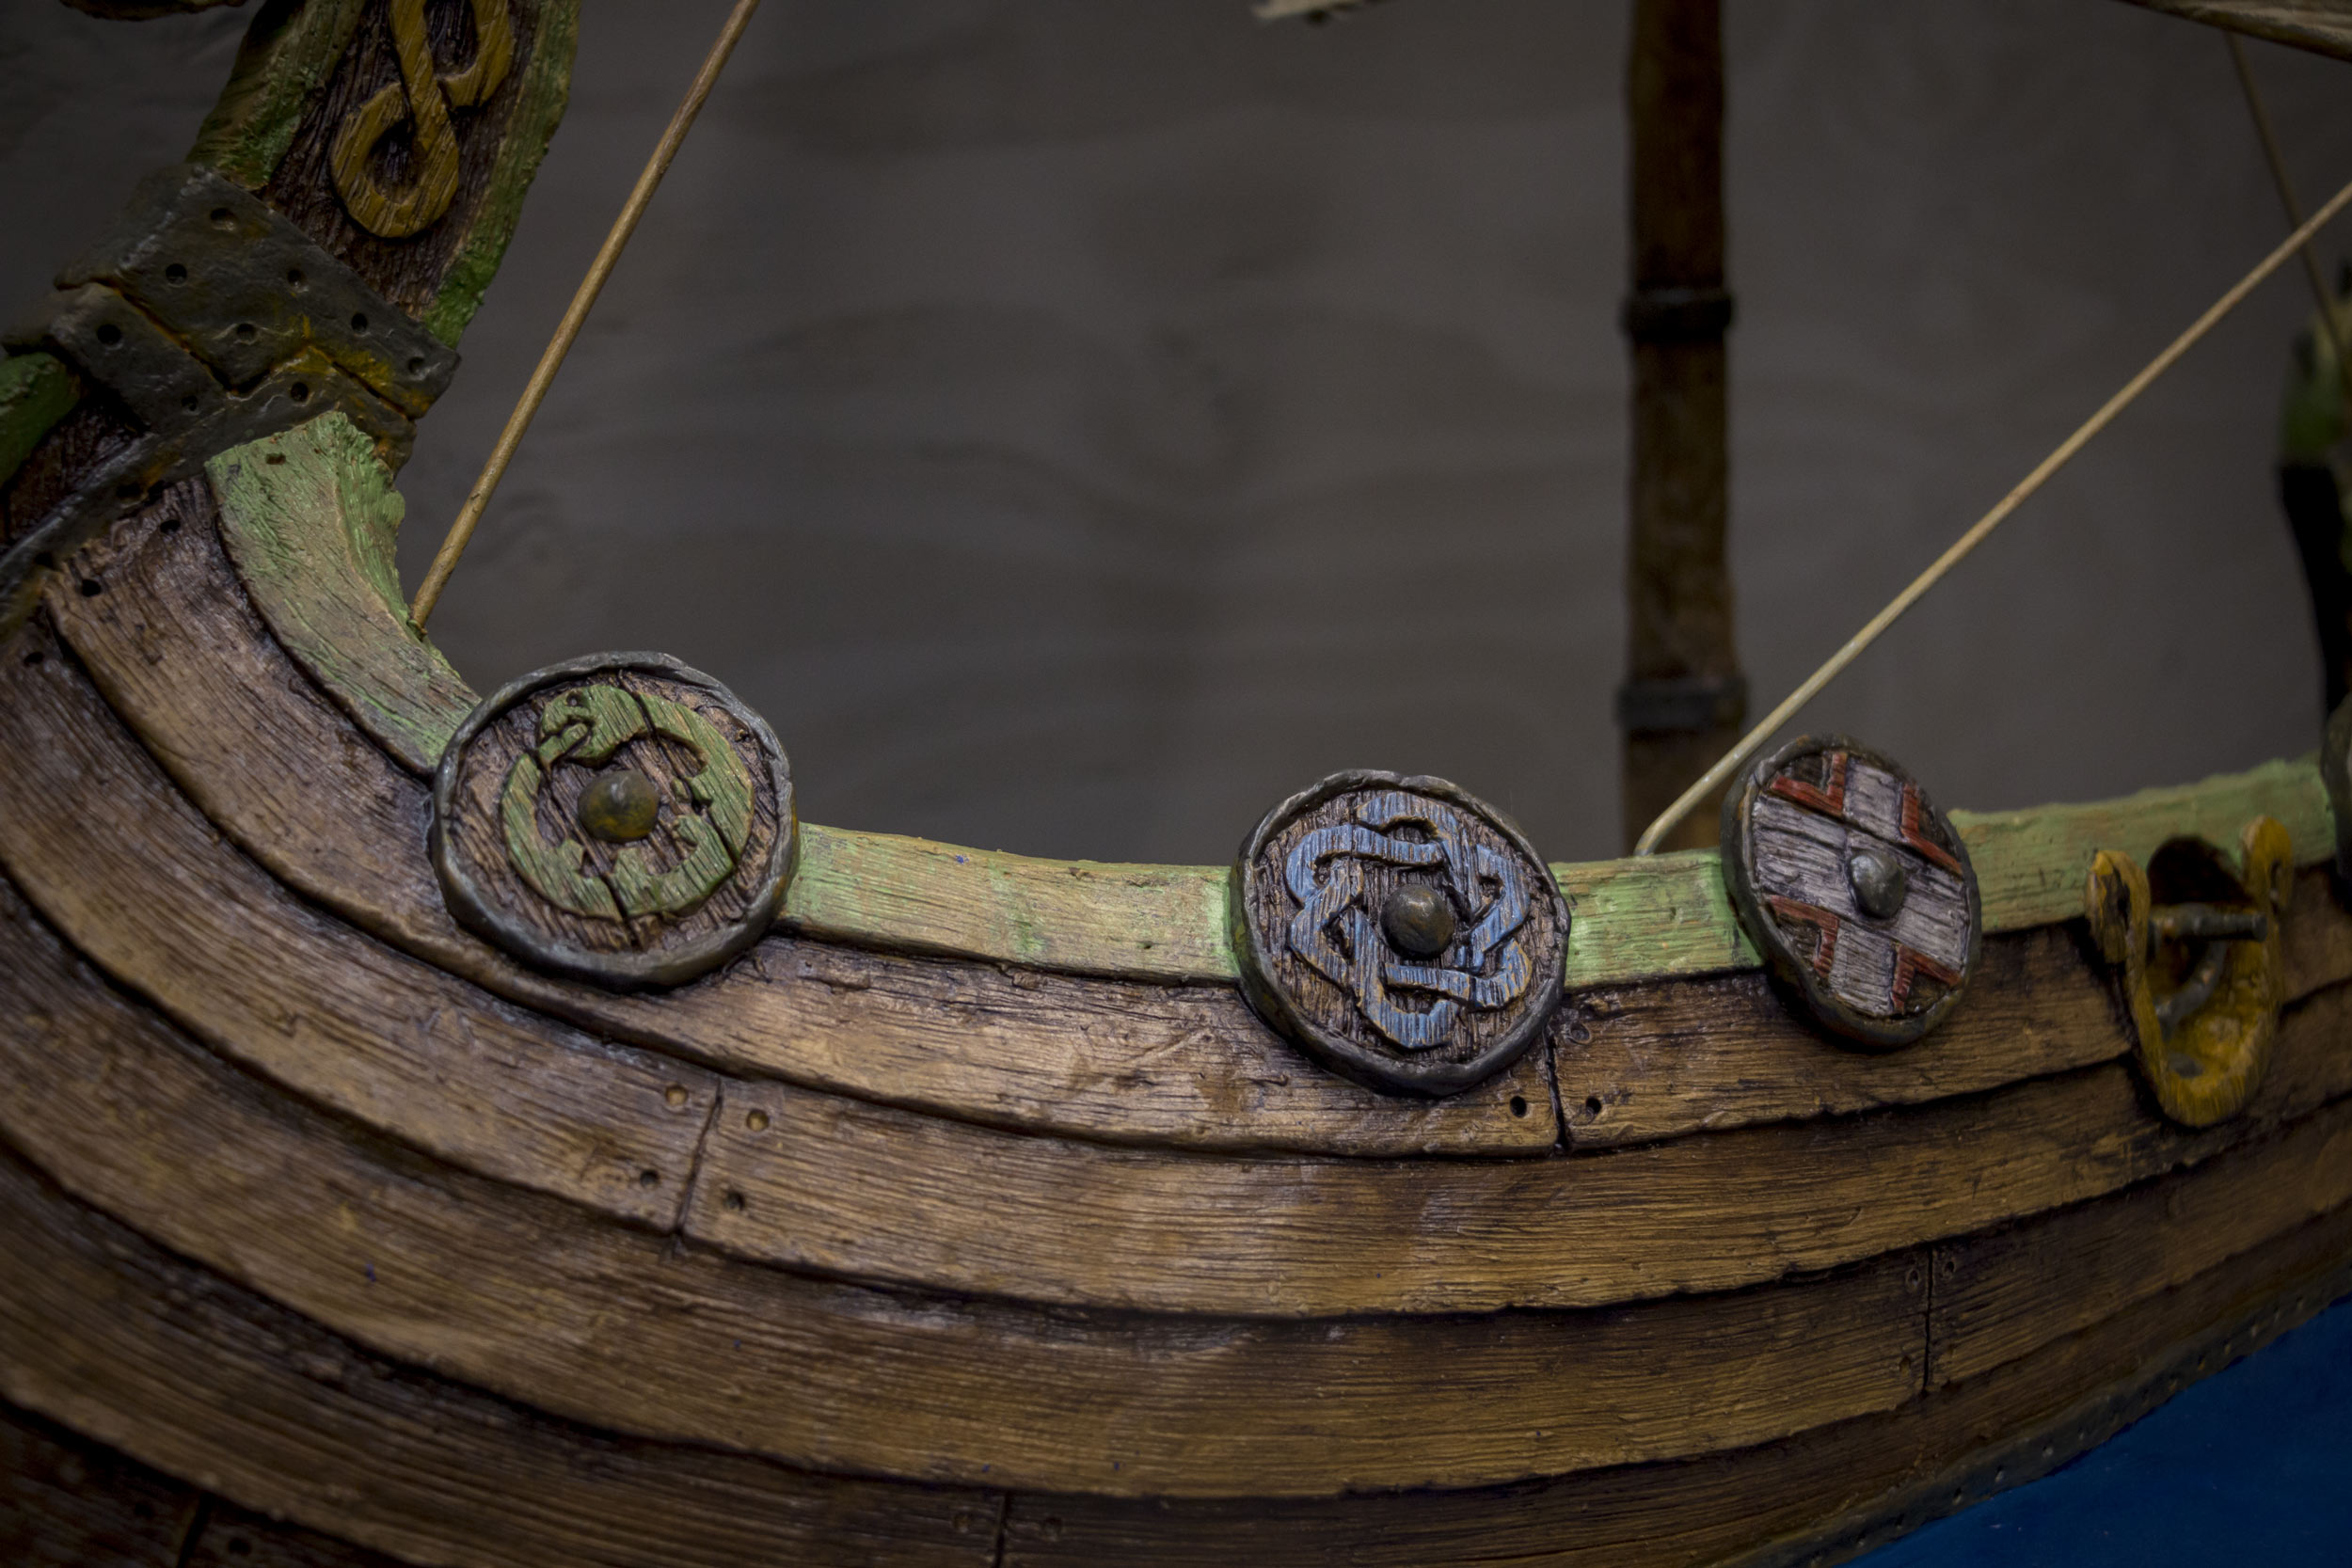 viking-ship-model-5.jpg